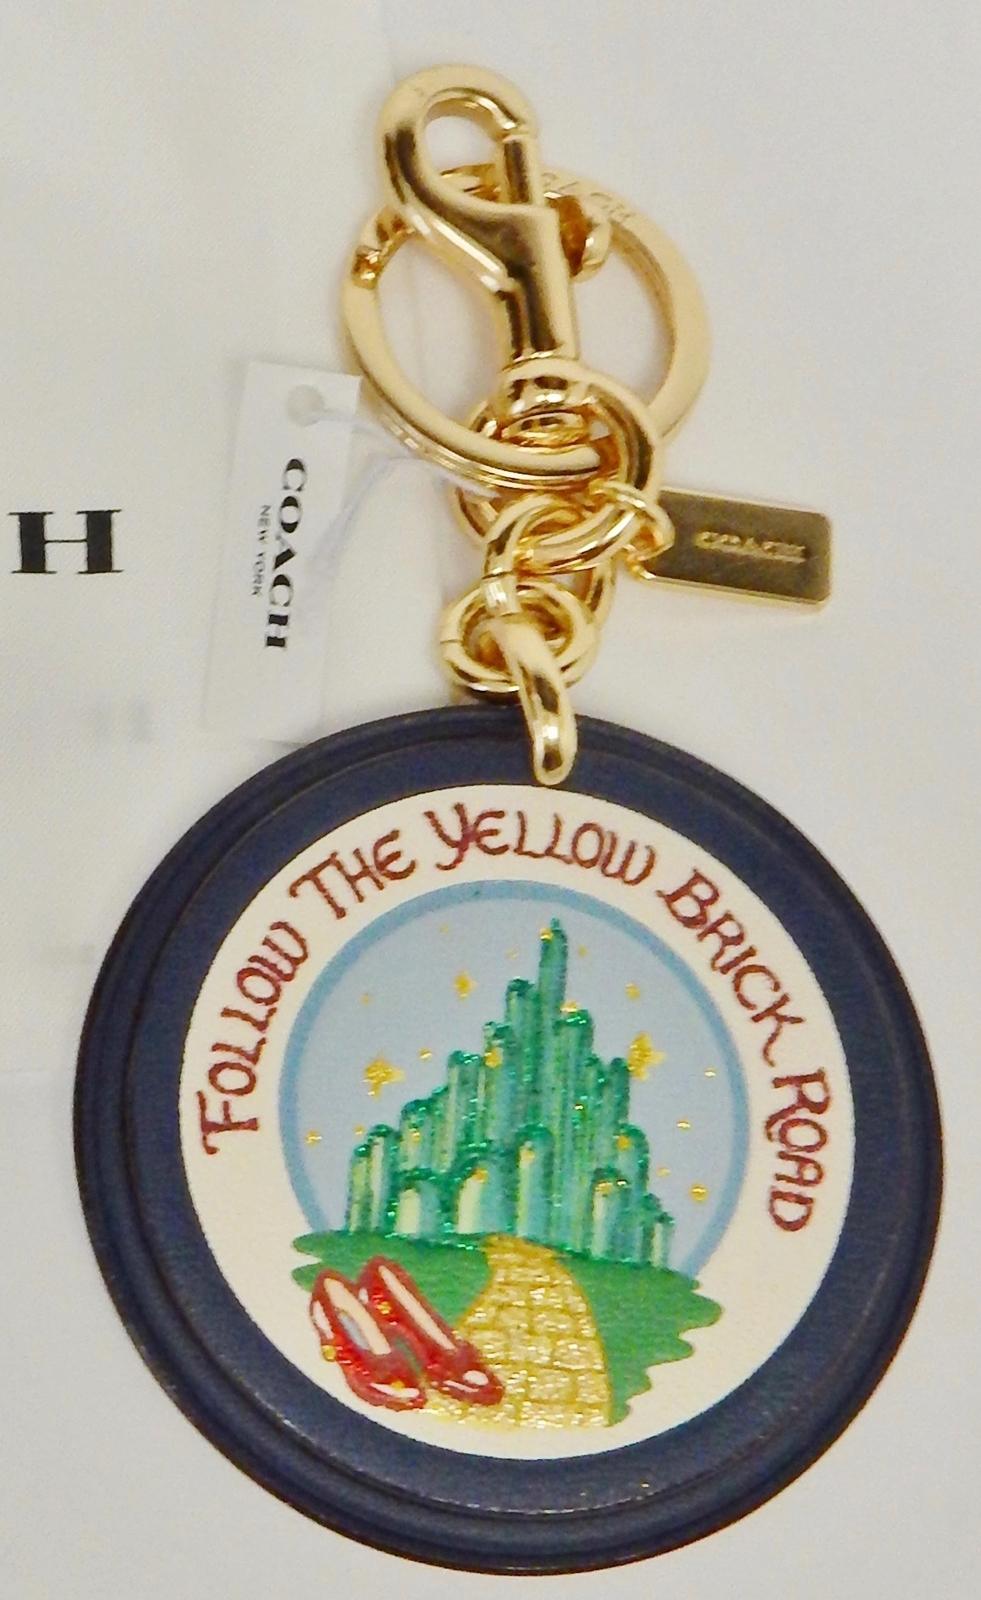 347b5fba395 Coach Wizard of Oz Handbag Charm Keychain and 50 similar items